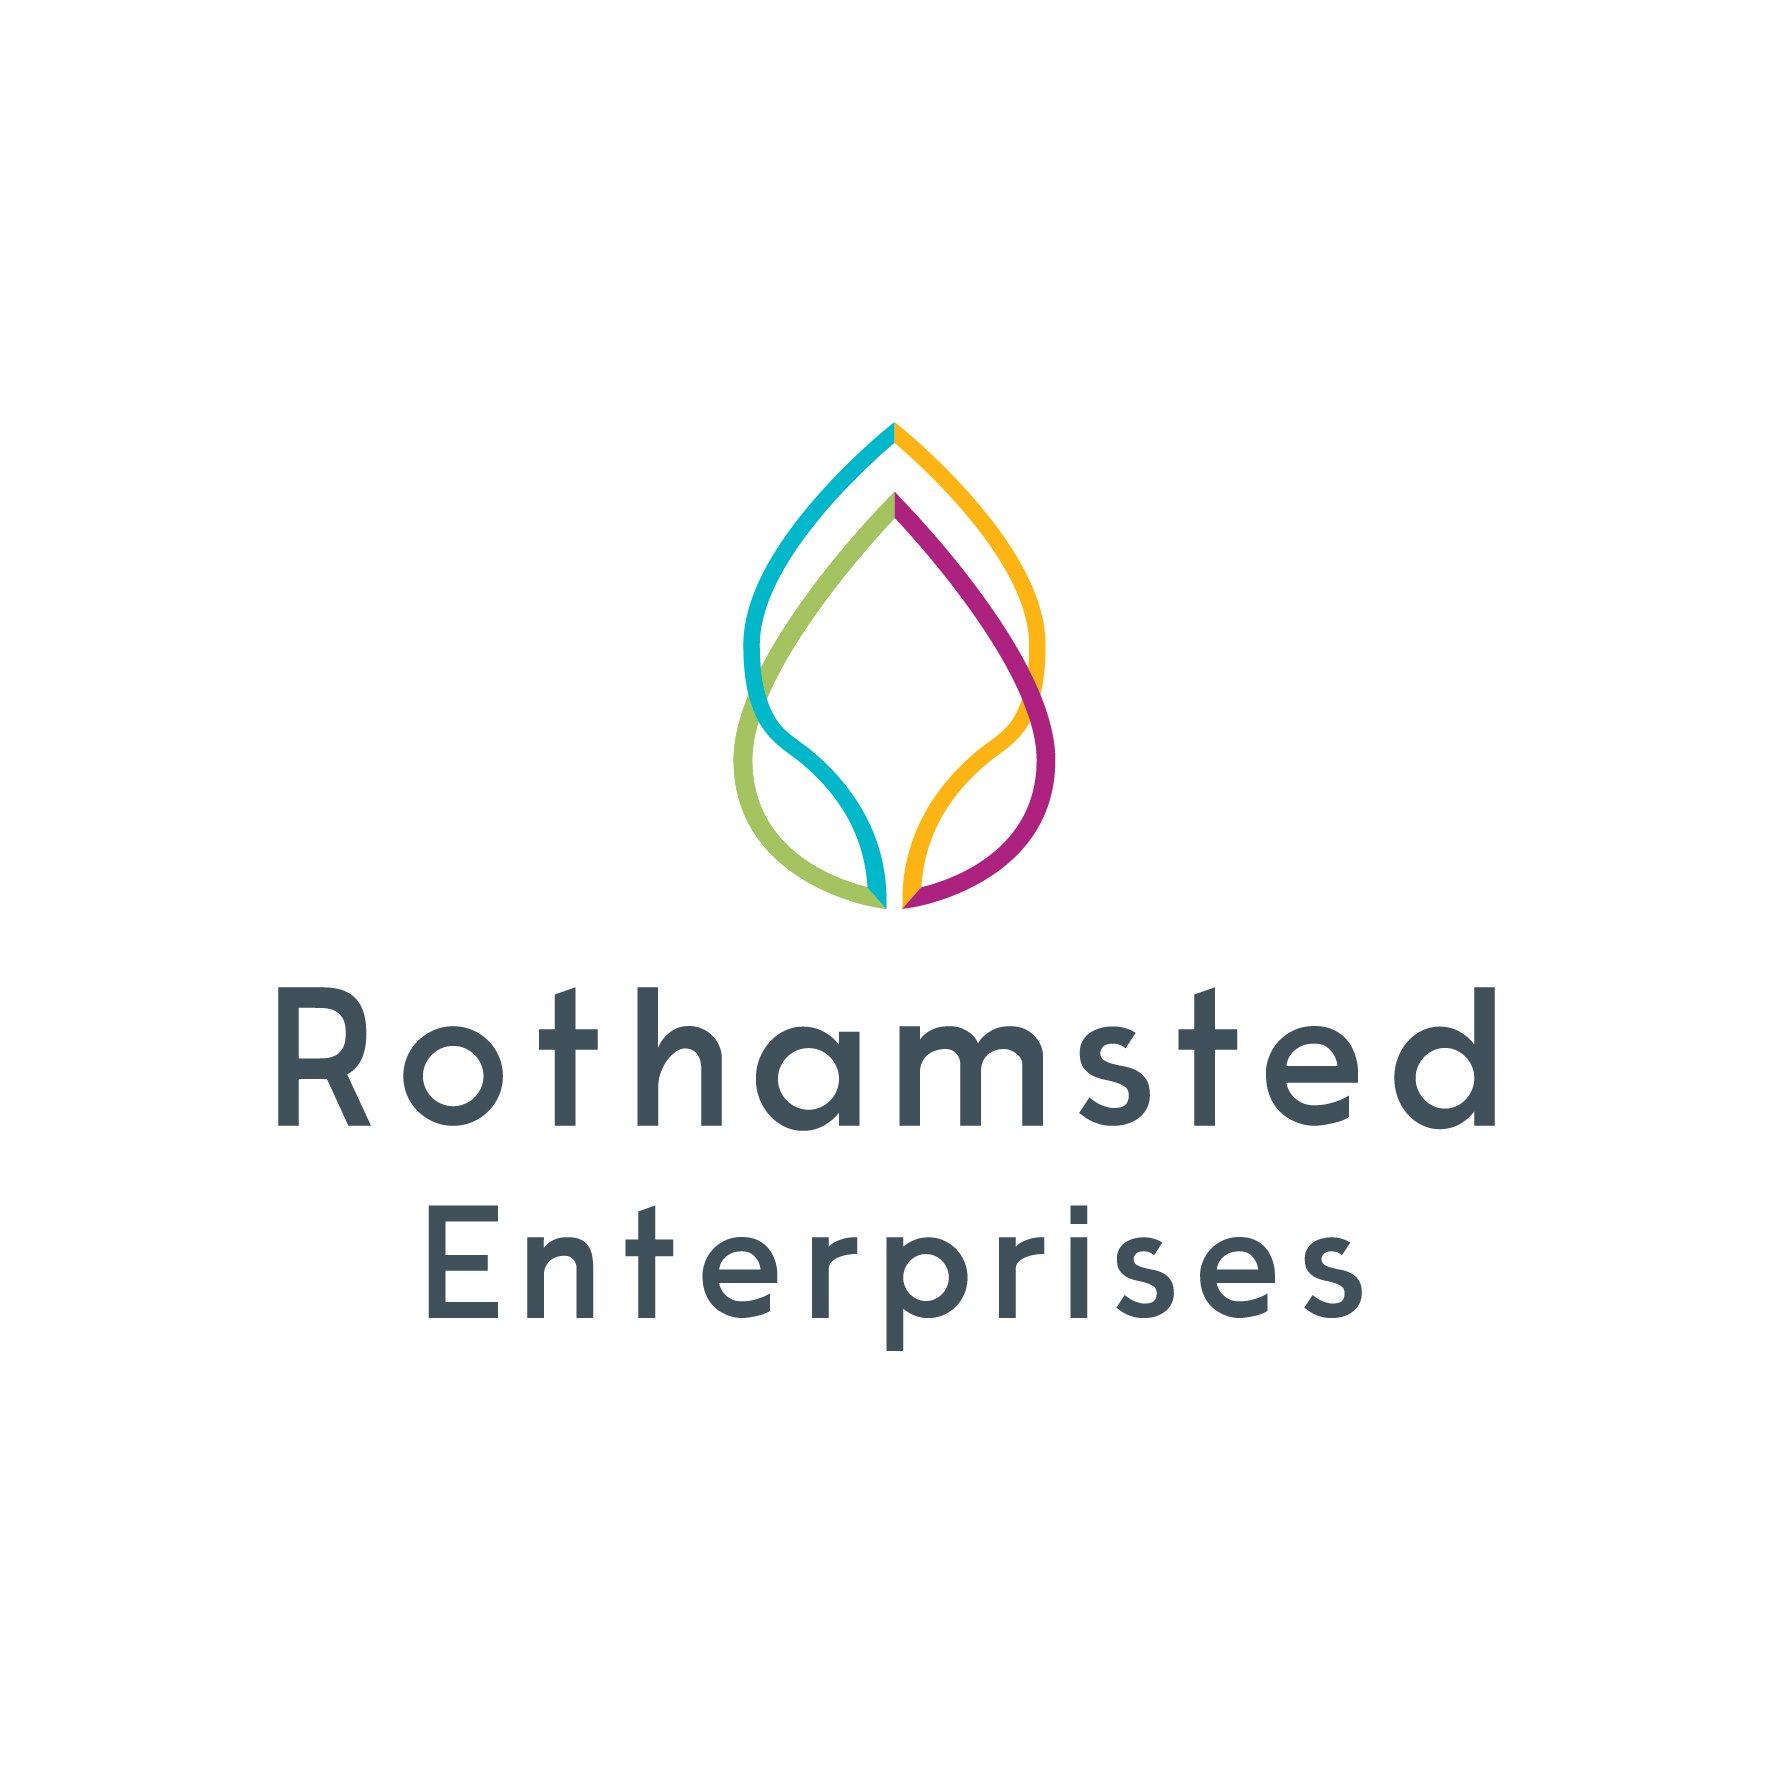 Sustainability-focused partnership between Hertfordshire's Rothamsted Enterprises and JPA Workspaces